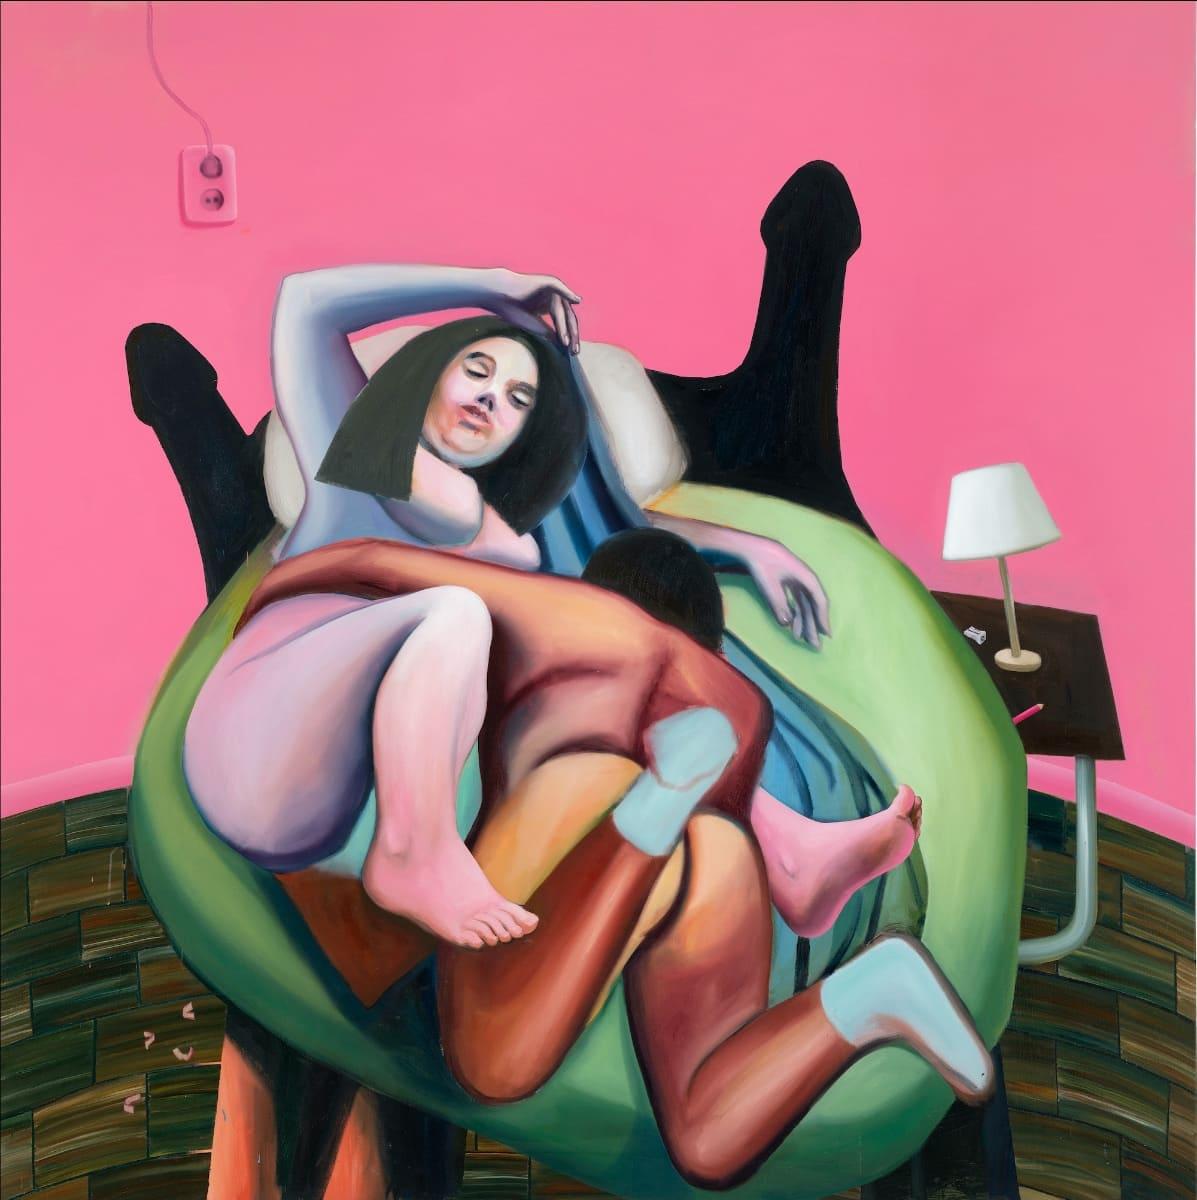 ERROR EXPLANATION: Ivana de Vivanco, Coming around, 2020, Öl auf Leinwand, 190 x 190 cm